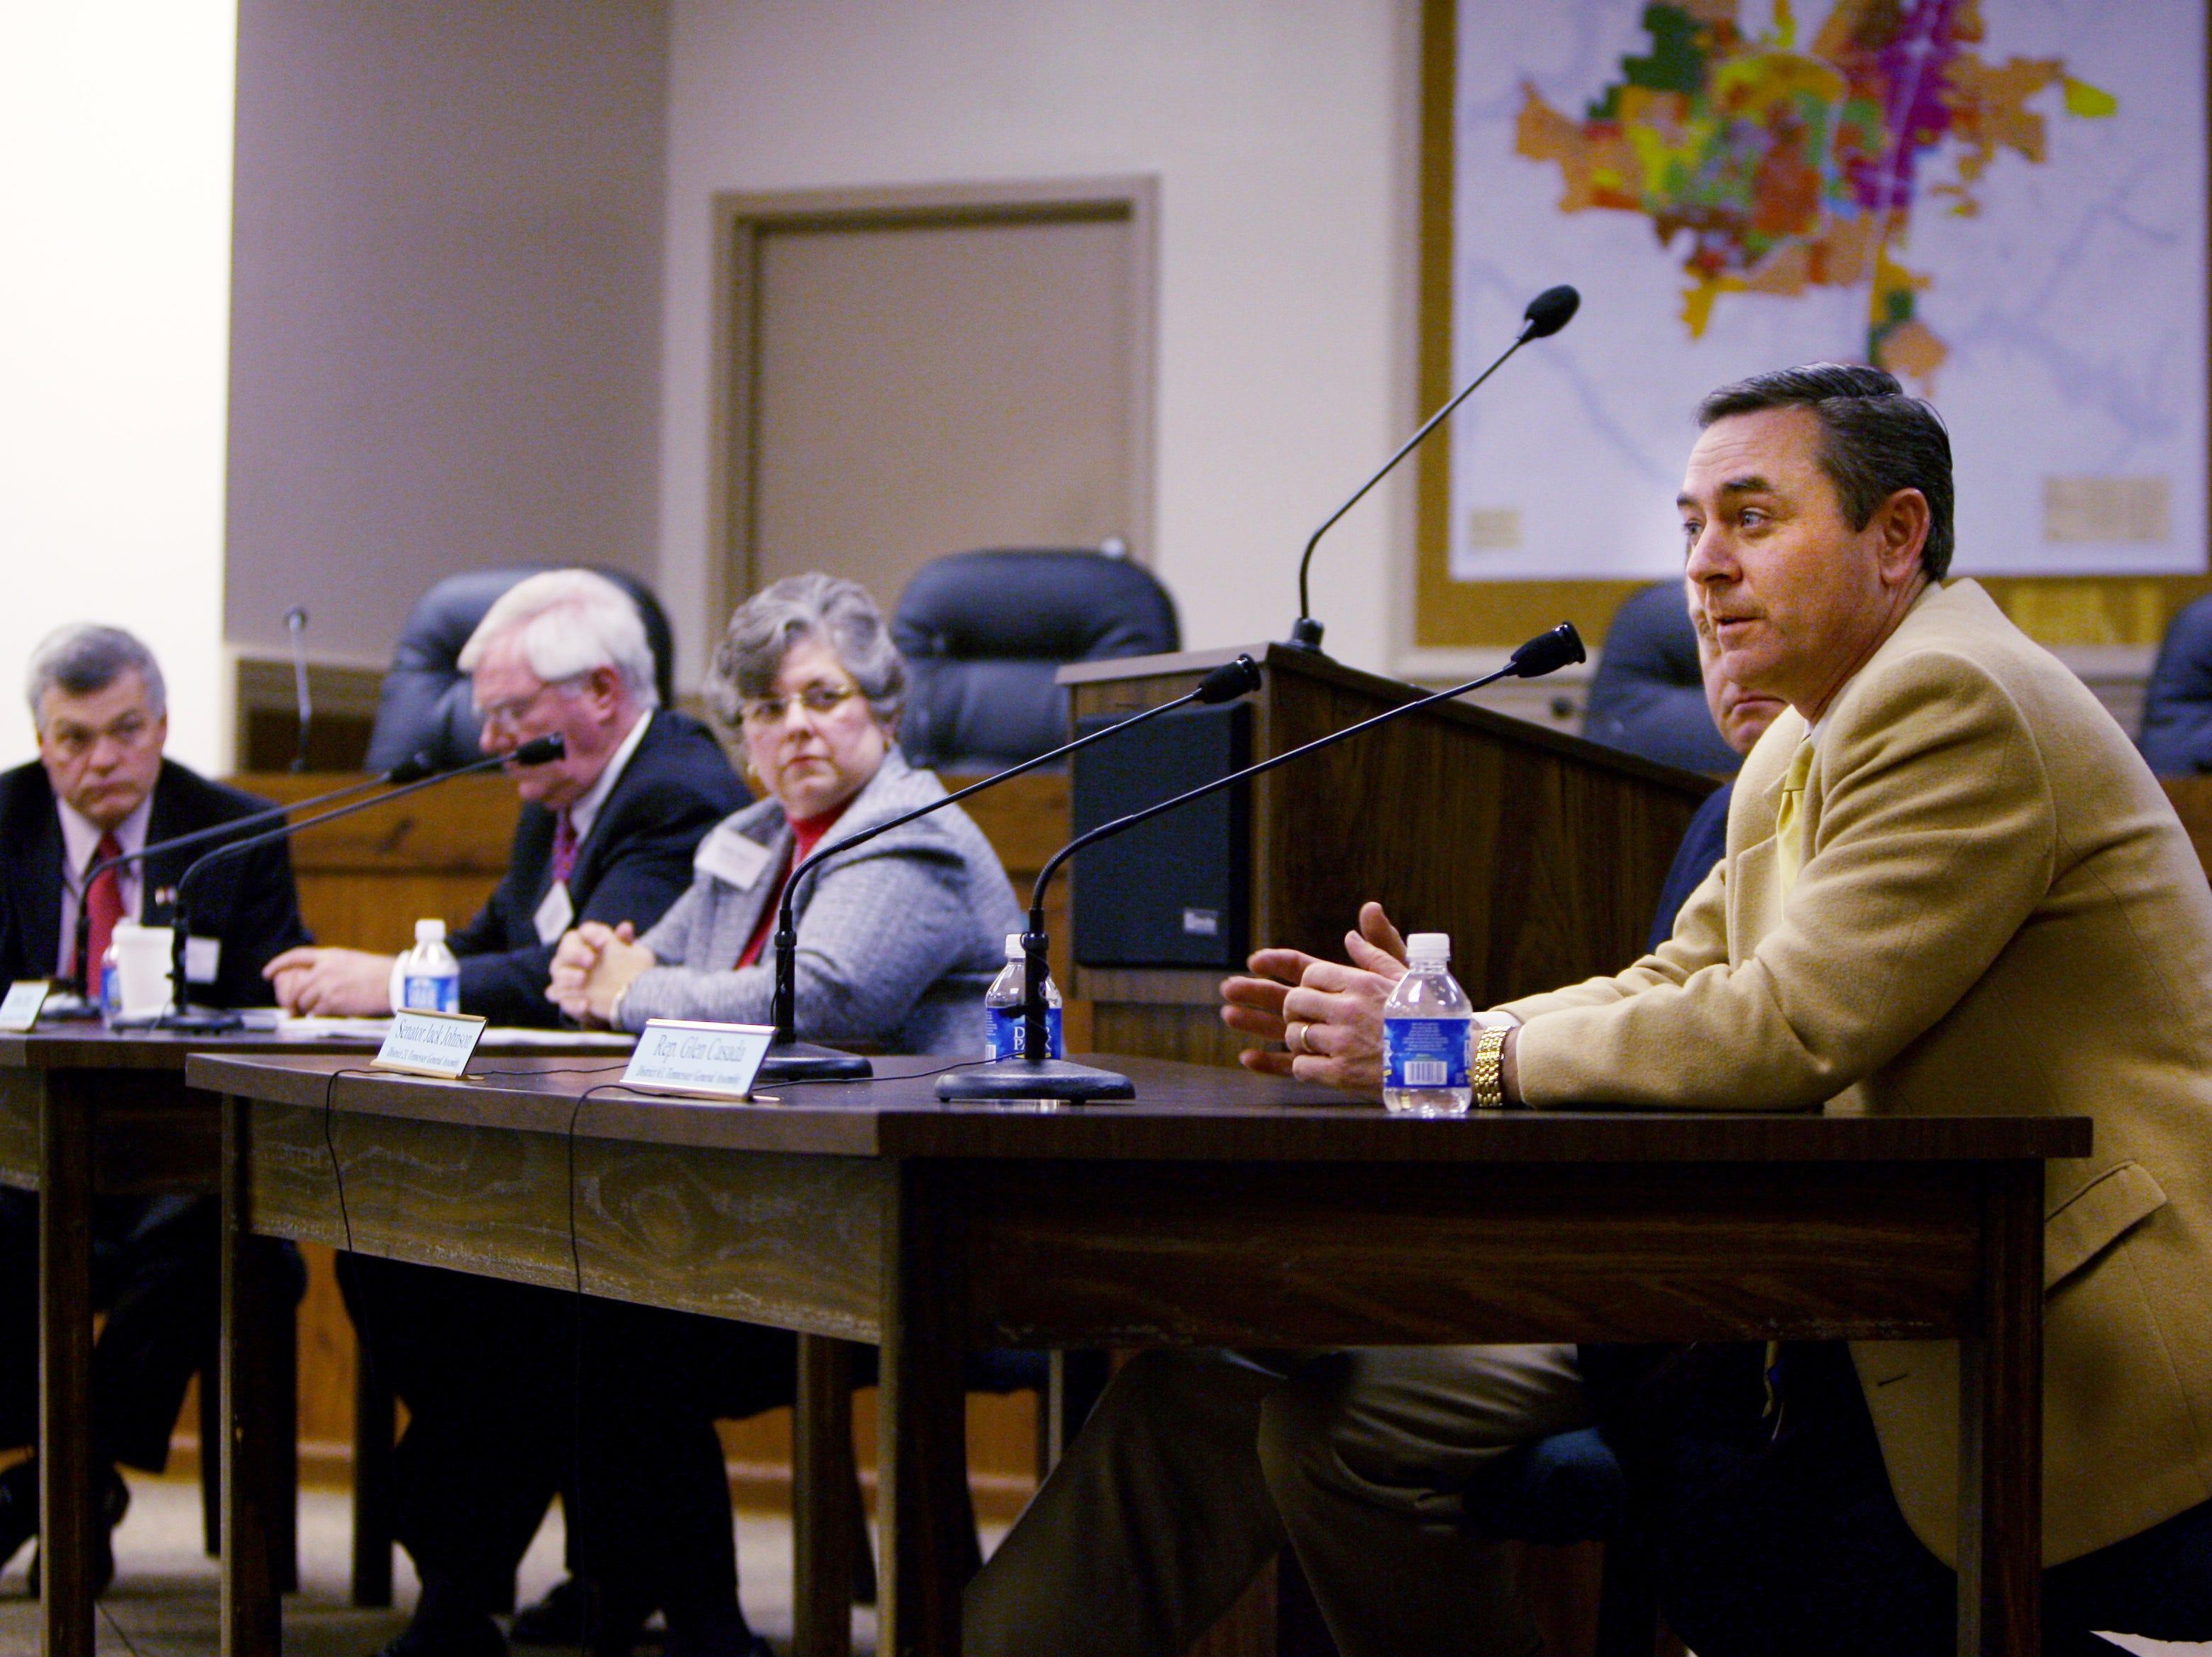 Rep. Glen Casada, right, speaks during a transportation summit at Franklin City Hall on March 7, 2008.